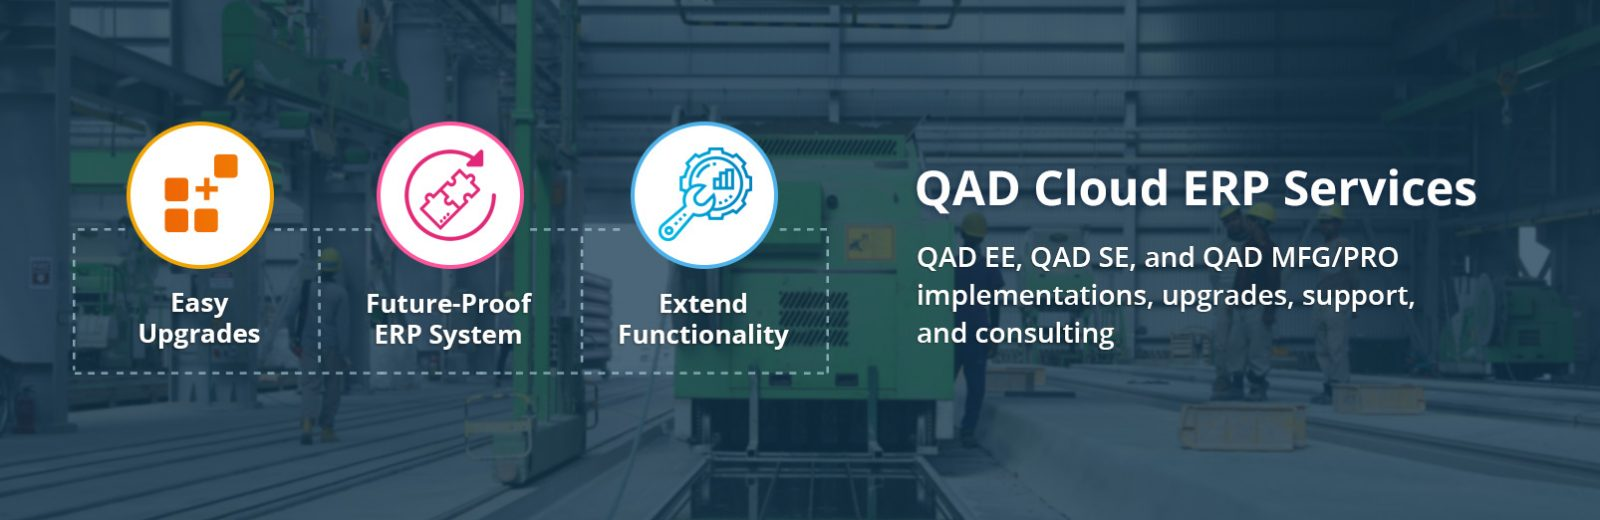 qad-cloud-erp-services-banner